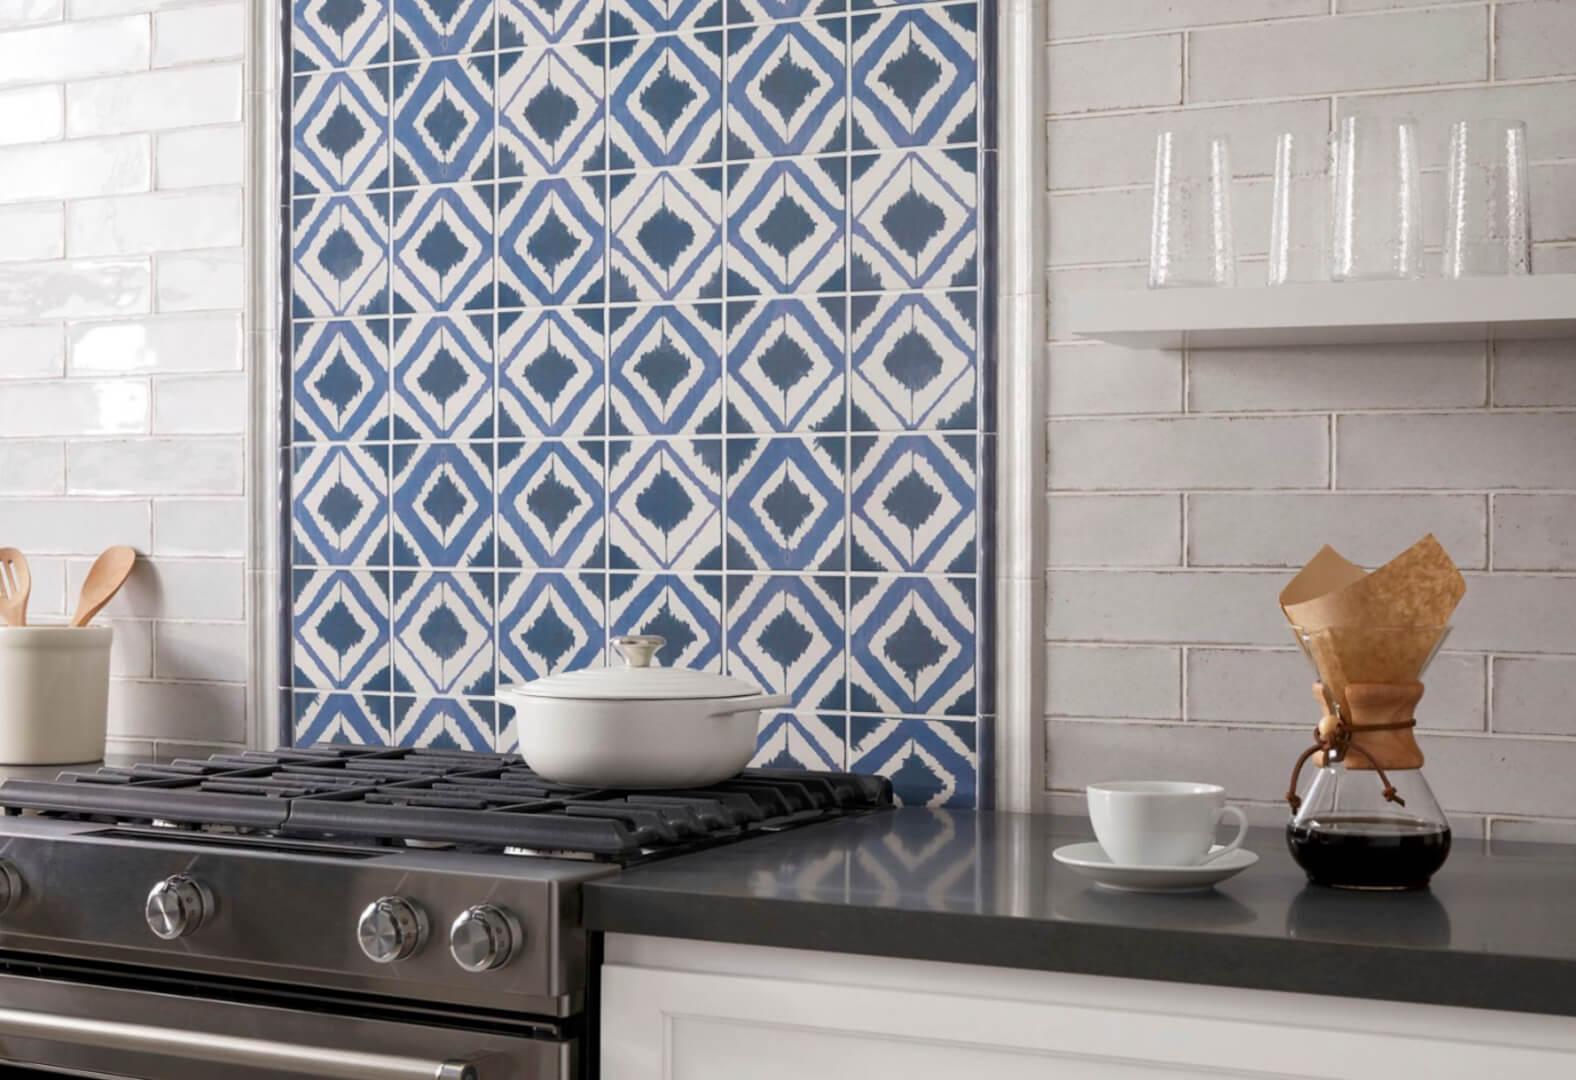 annie selke shadow ceramic tiles